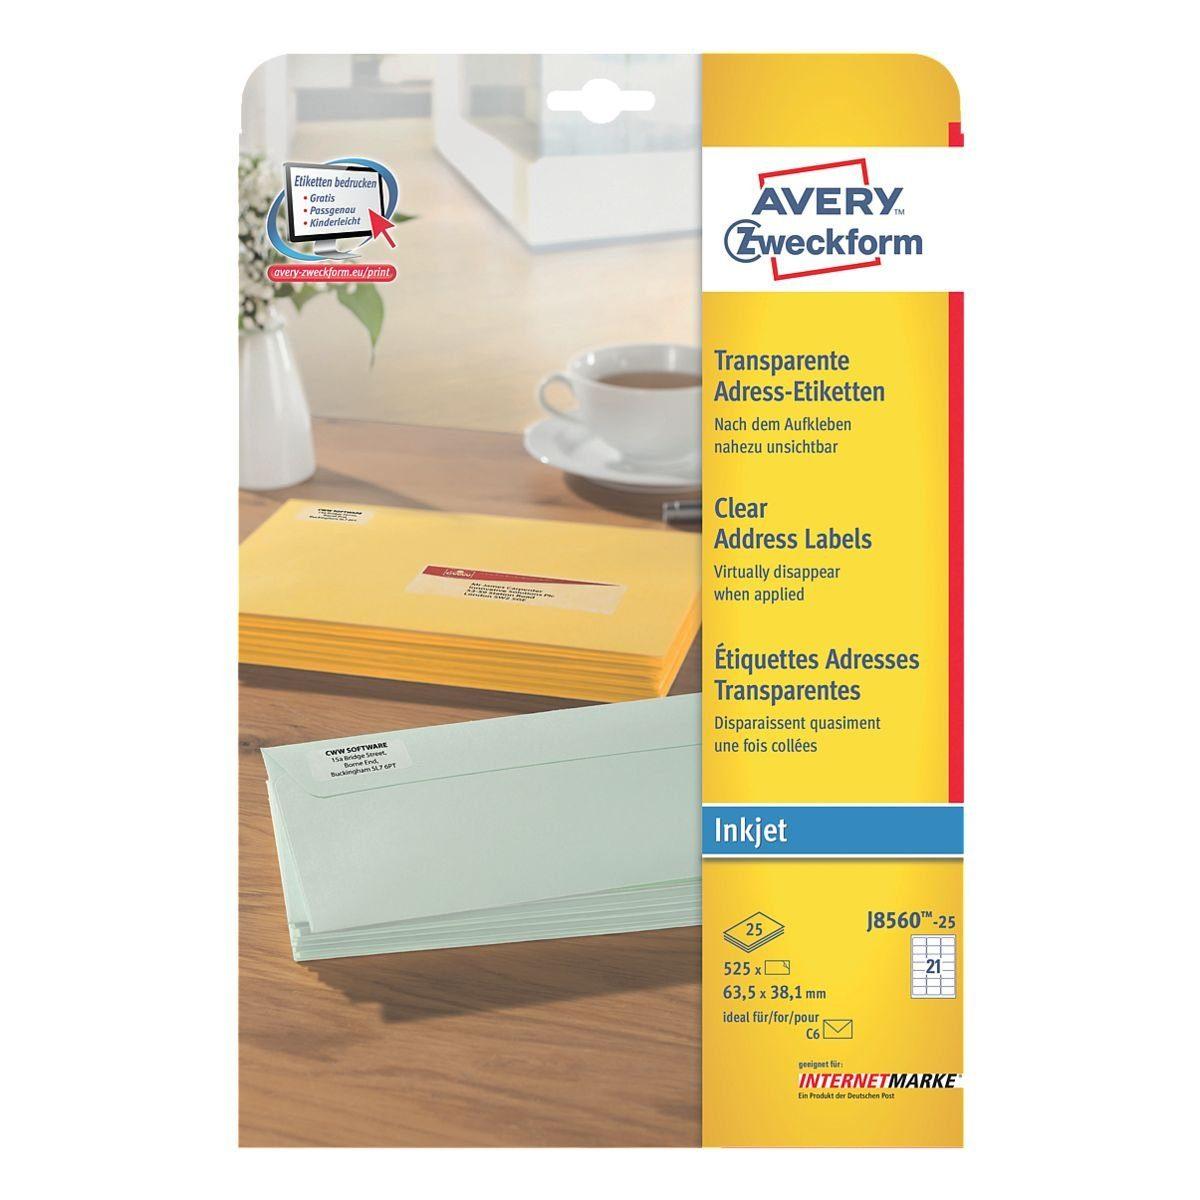 Avery Zweckform 525er-Pack Folien-Etiketten »J8560-25«